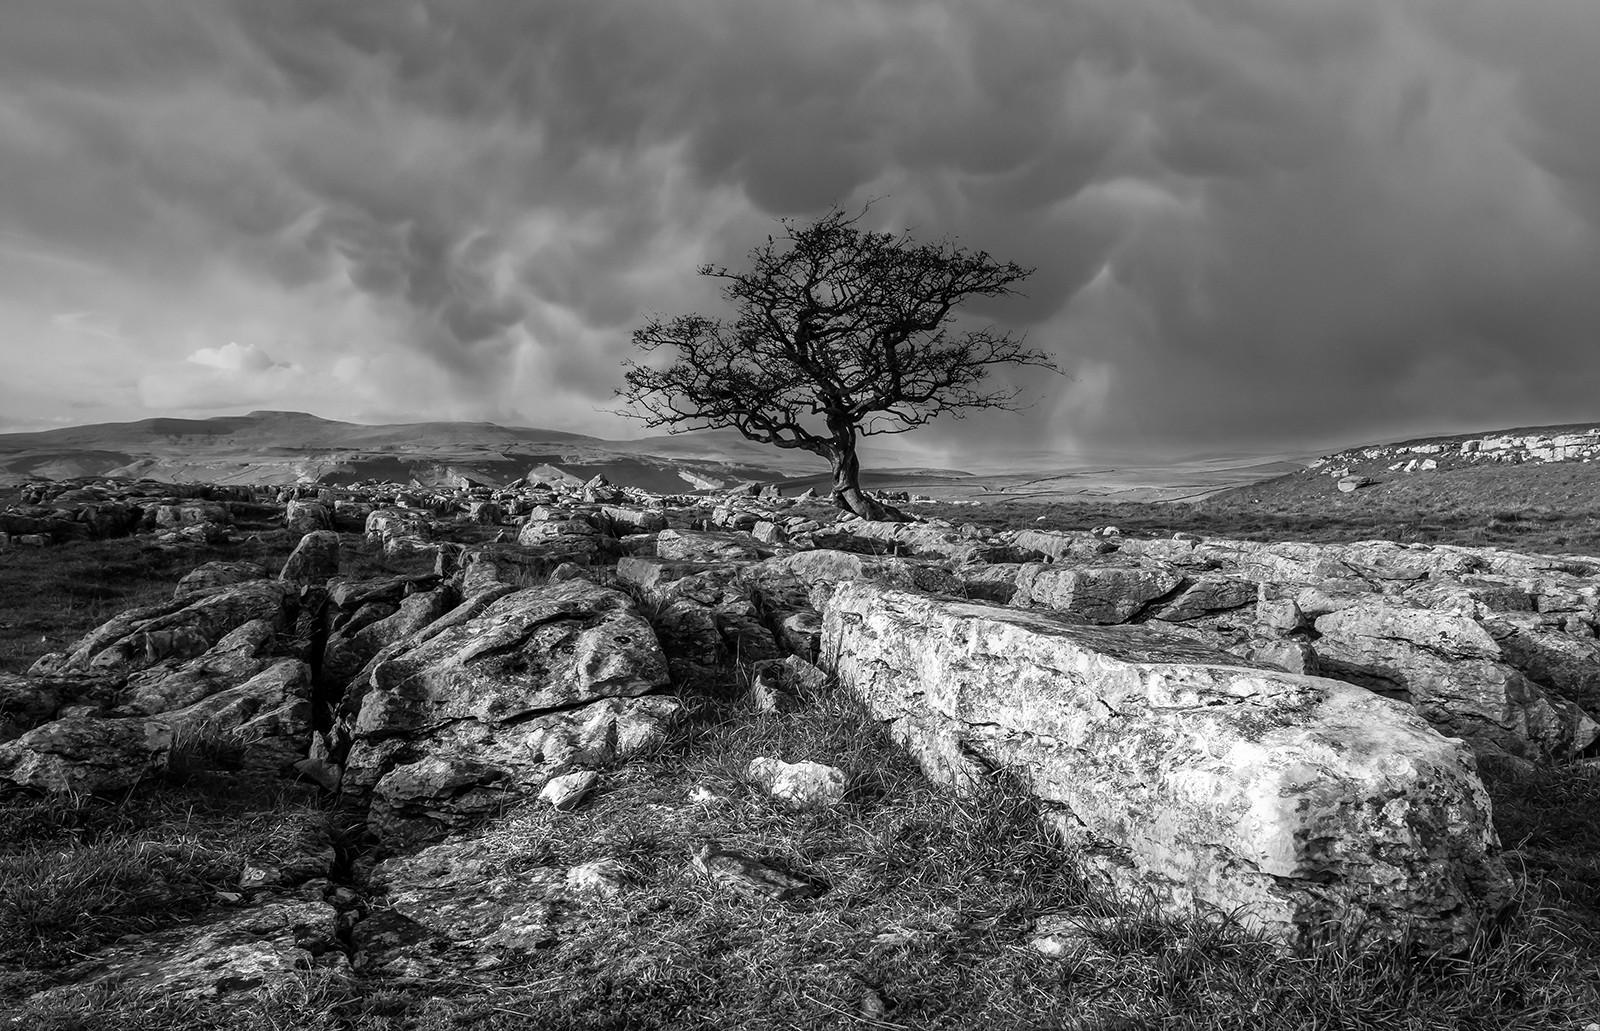 Stormy Skys over Winskill Stones